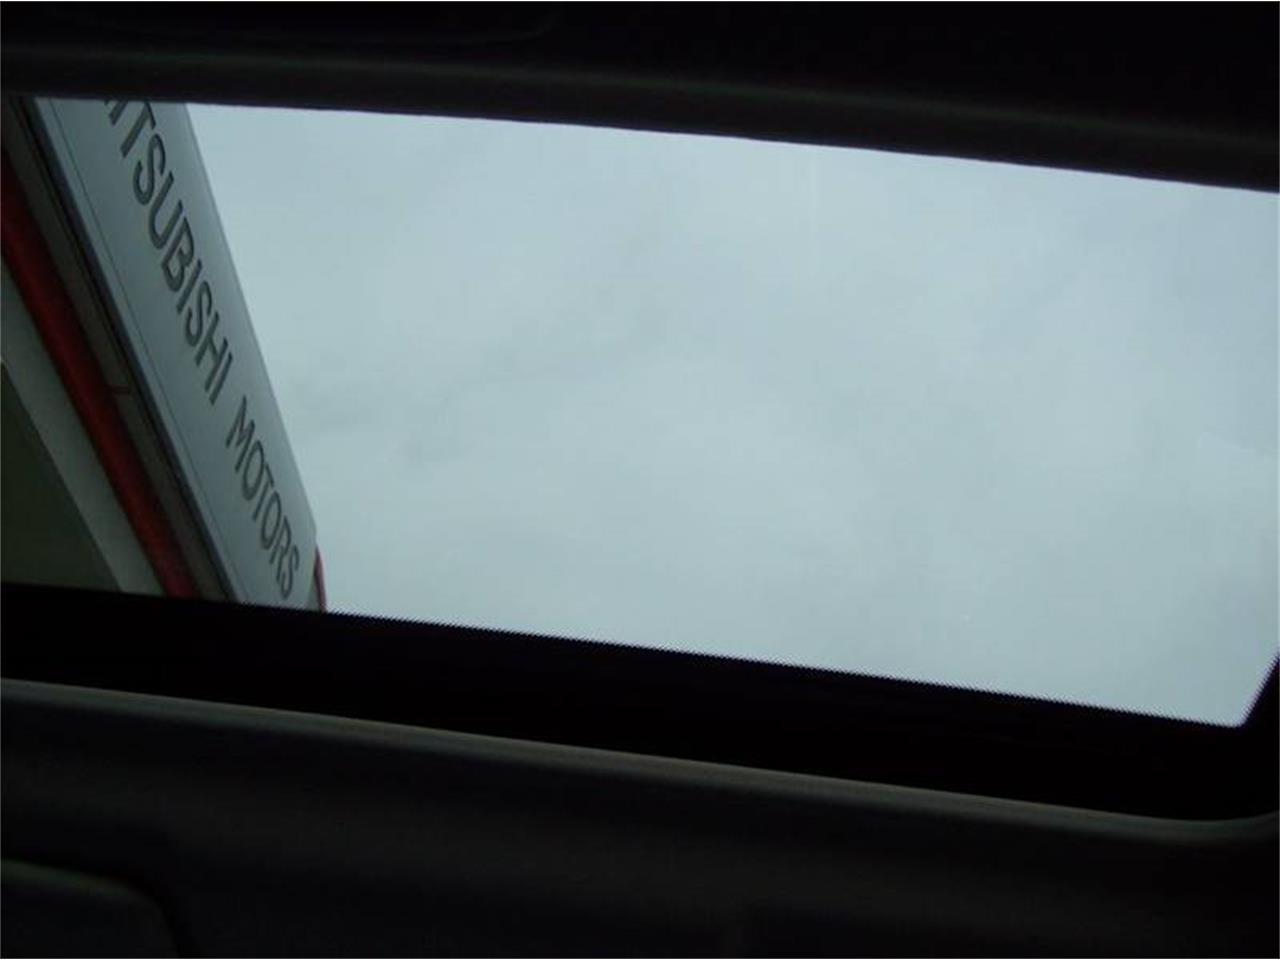 Large Picture of '17 Mitsubishi Outlander - $25,249.00 - LG8N